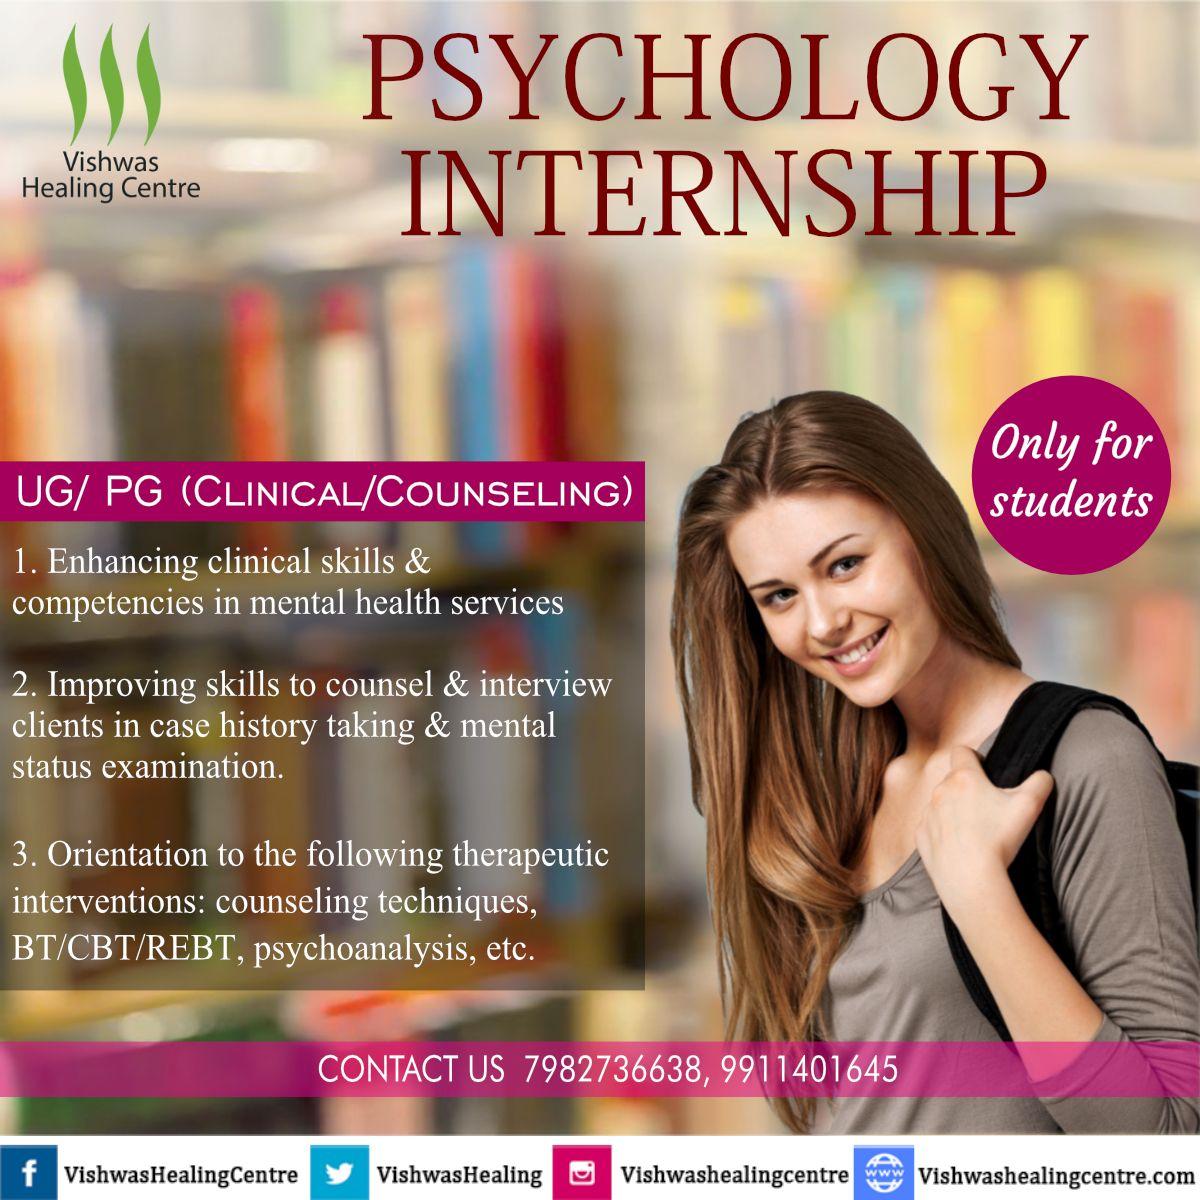 Psychology Internship Ug Pg Clinical Counseling Clinical Psychology Psychology Internships Counseling Techniques